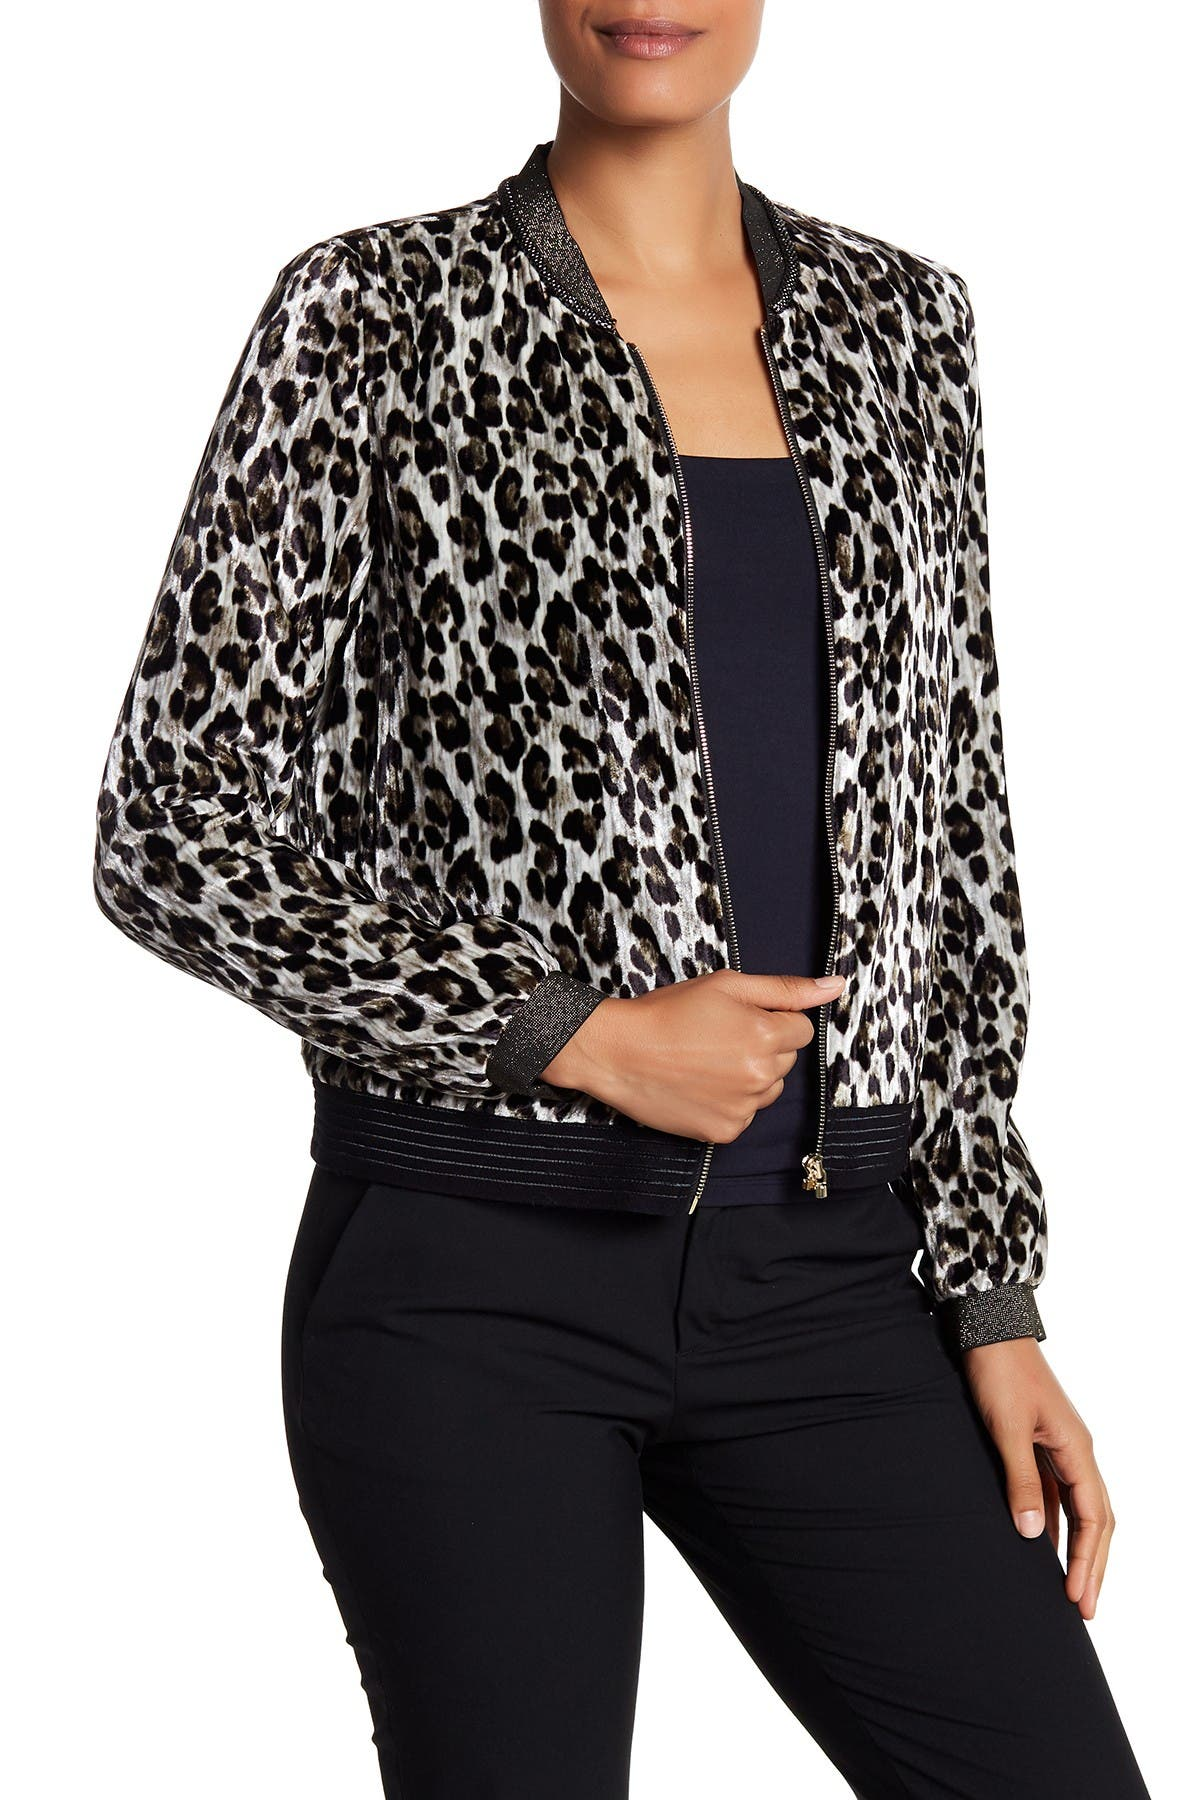 T Tahari Womens Fatima Velvet Floral Print Blazer Bomber Jacket Coat BHFO 0967